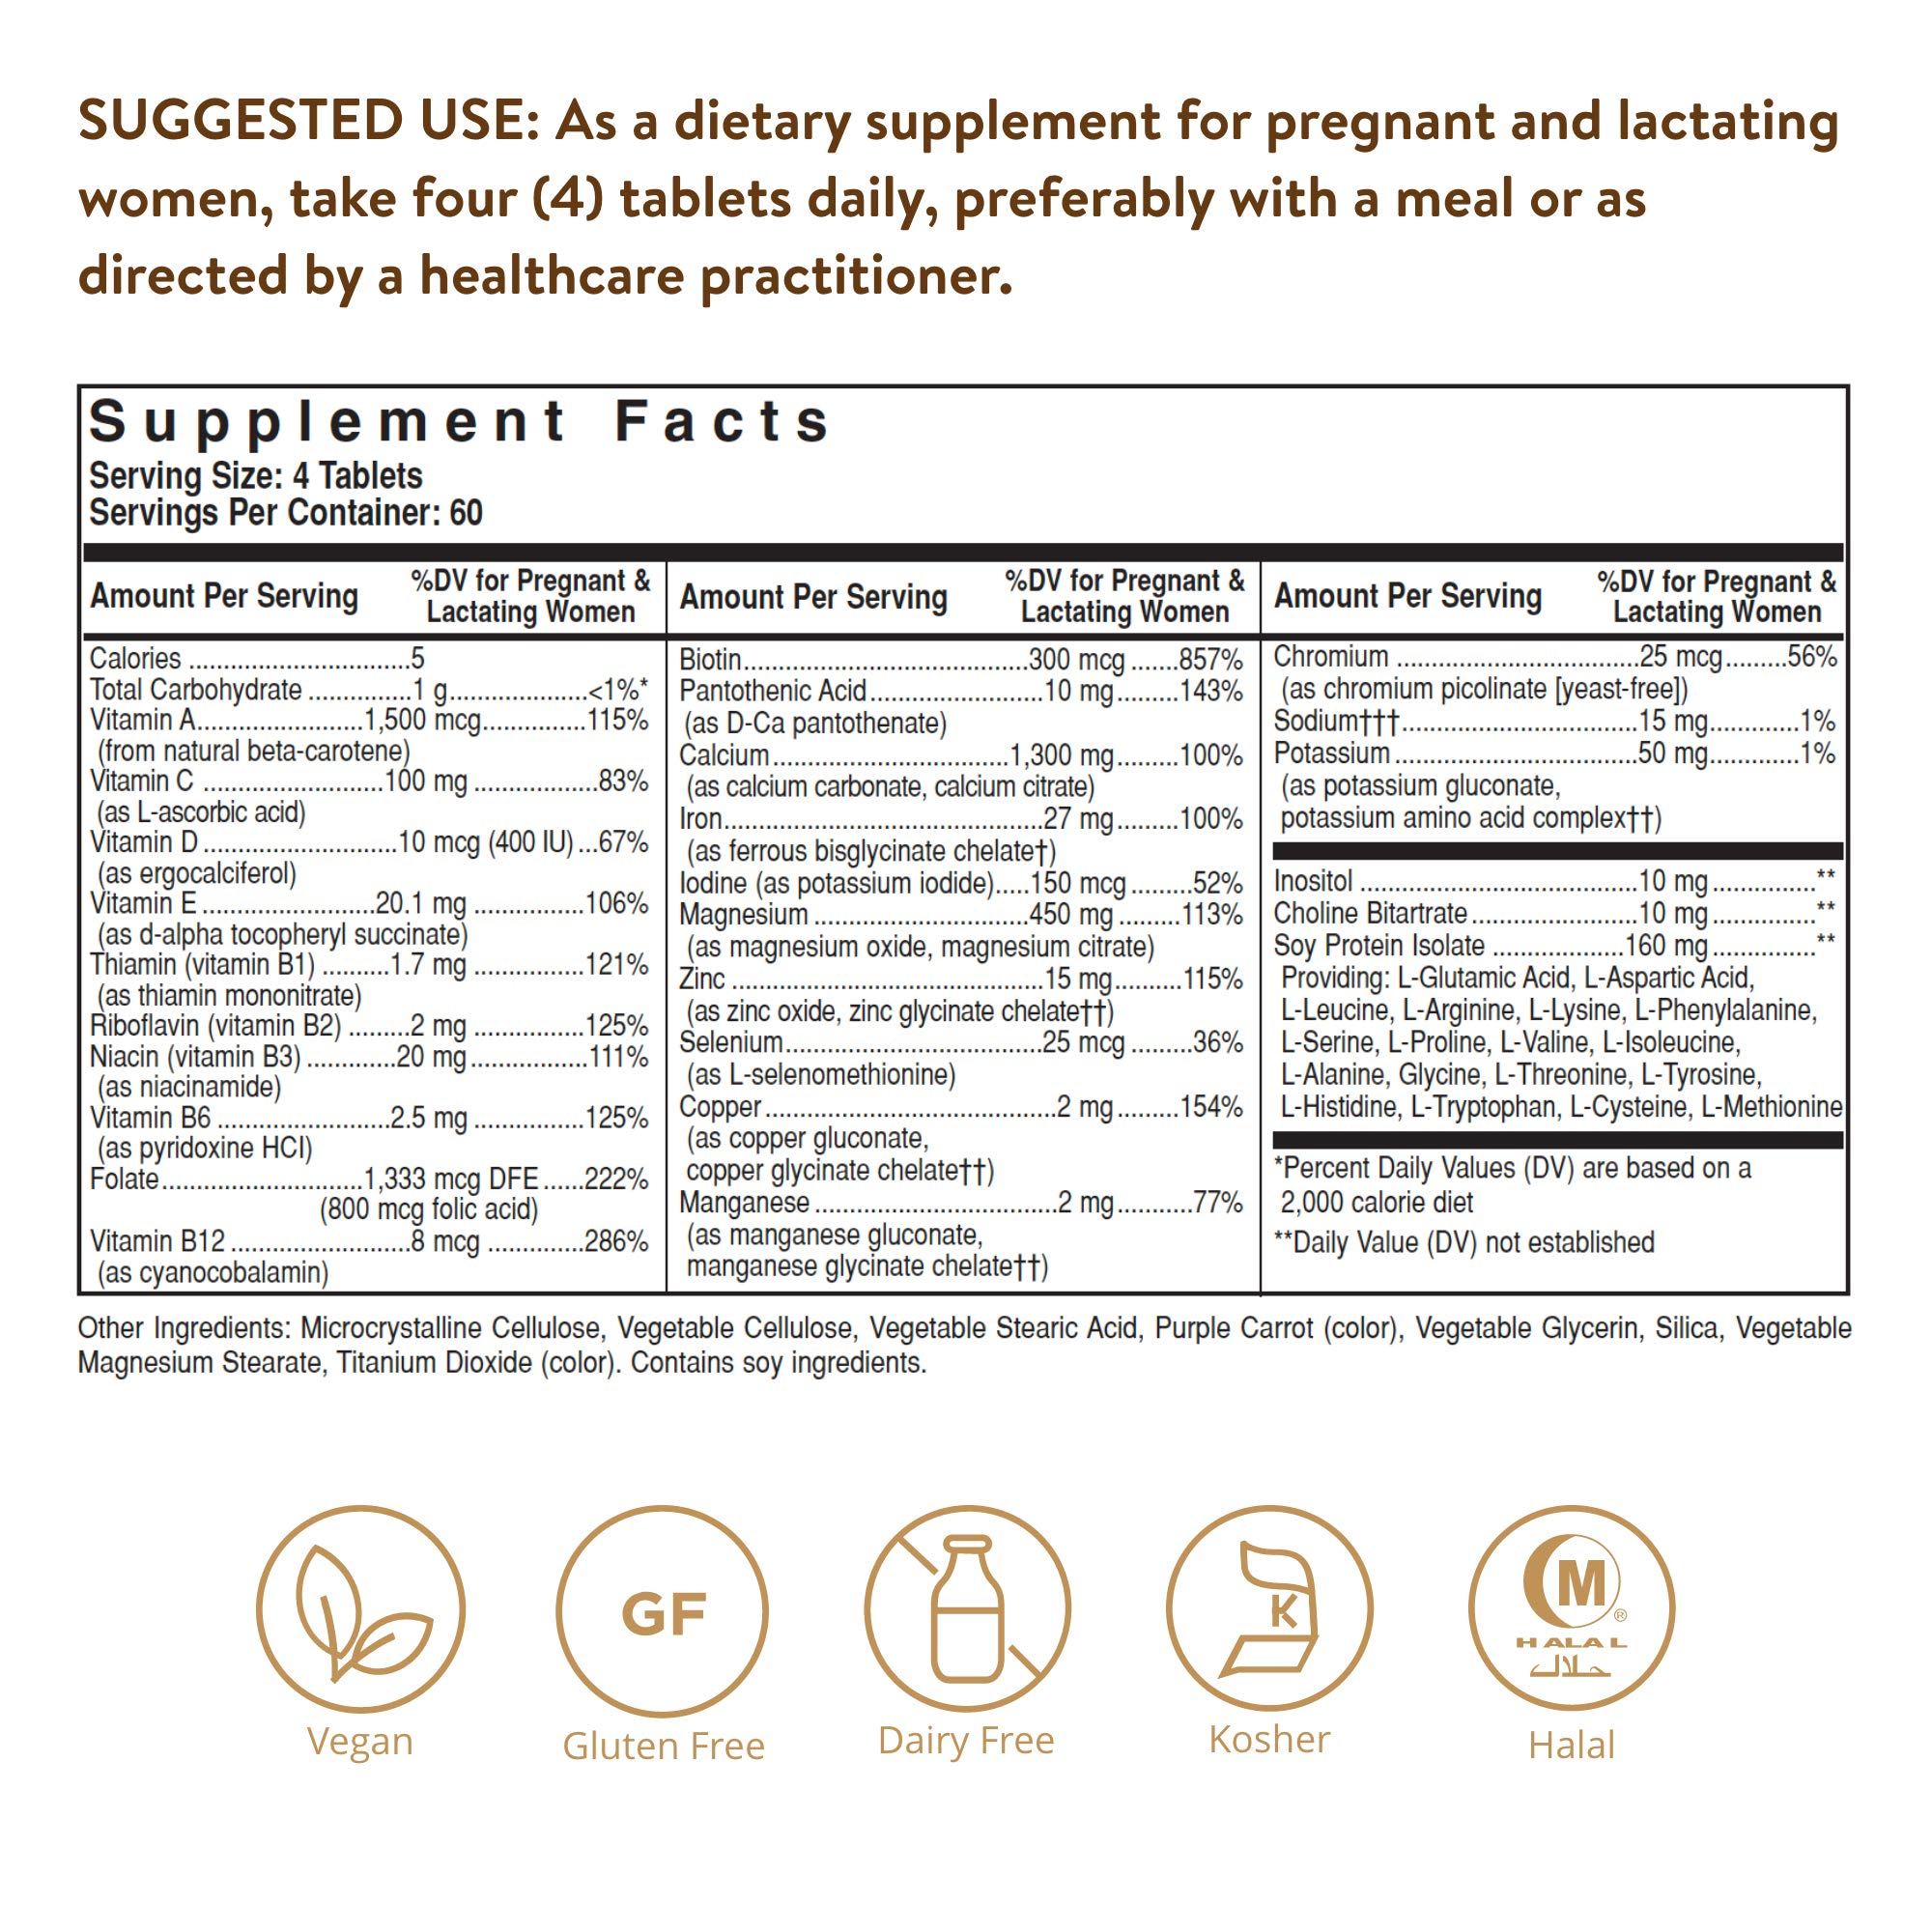 Solgar Prenatal Nutrients, 240 Tablets - Multivitamin & Mineral Formula for Pregnant & Lactating Women - Contains Zinc, Calcium Iron, Folic Acid, Vitamins C & E - Vegan, Gluten Free - 60 Servings